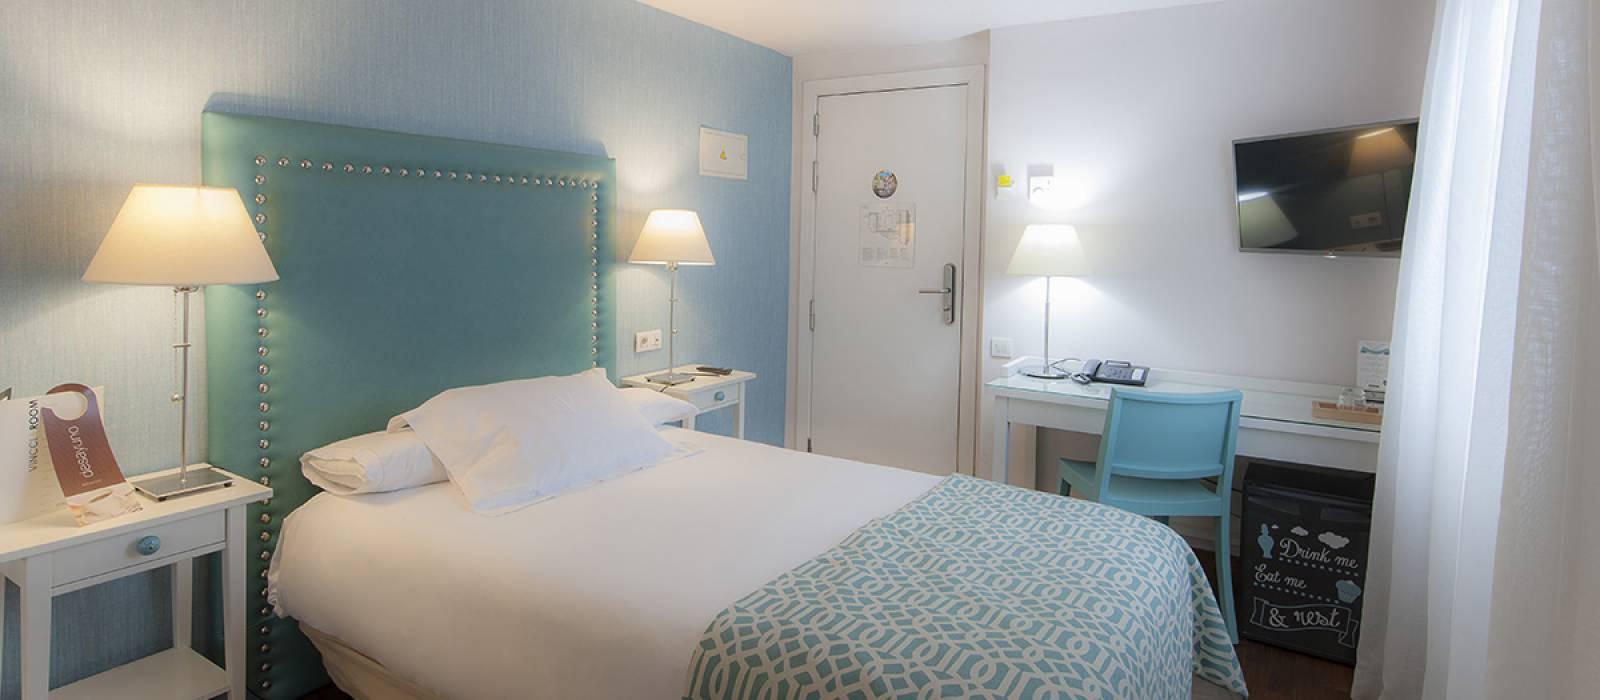 Soma Camere Hotel Madrid - Vincci Hoteles - Vincci Singola